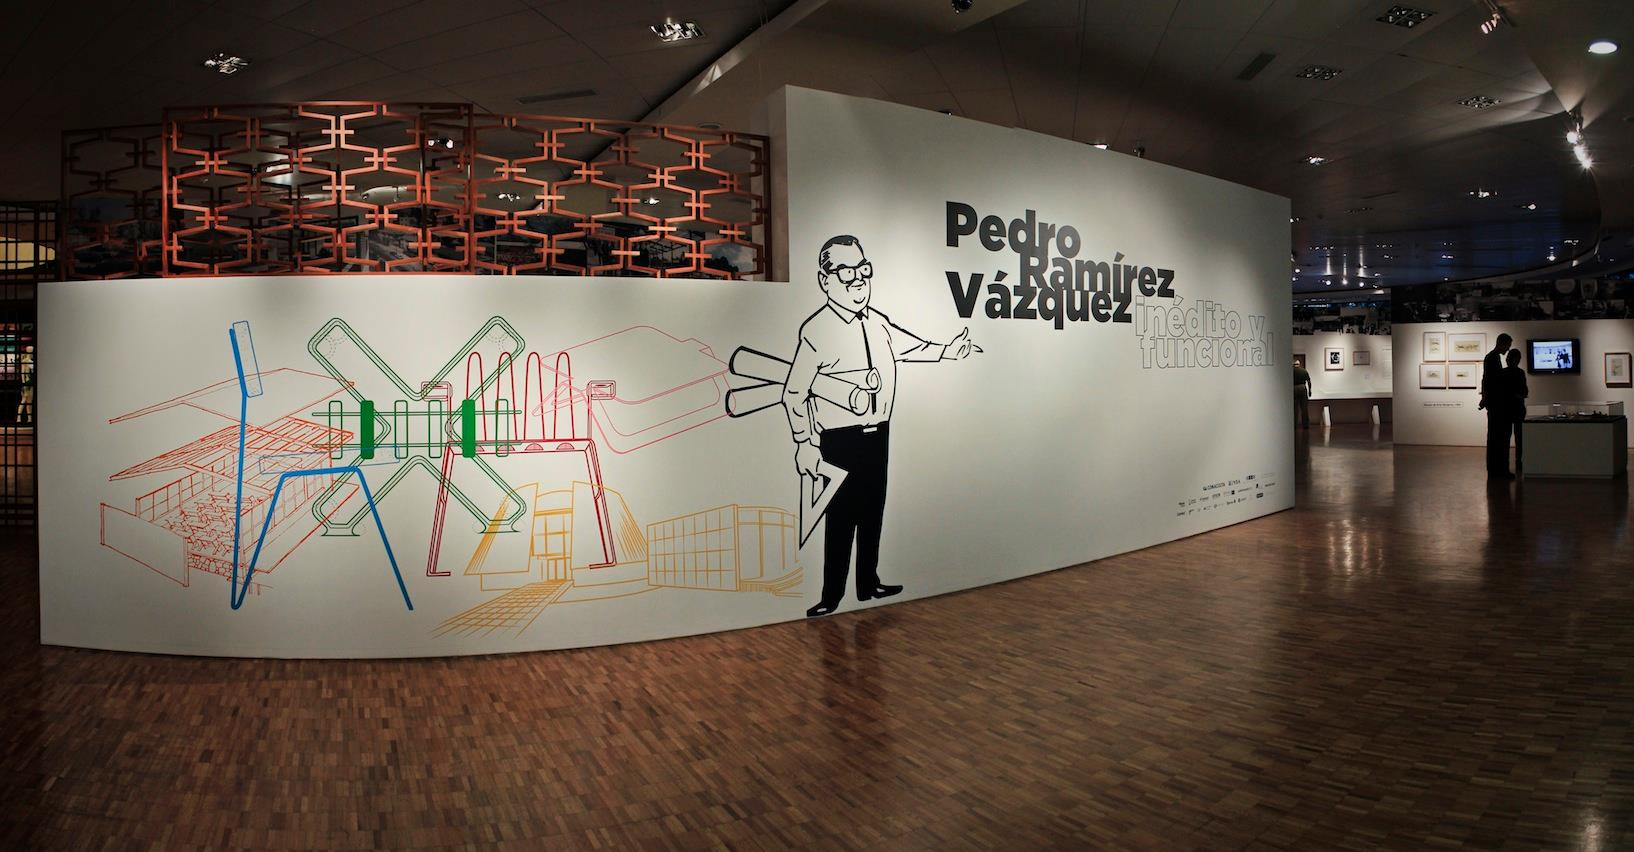 foto museo de arte moderno mexico facebook pedro ramirez vazquez 30 septiembre 2014